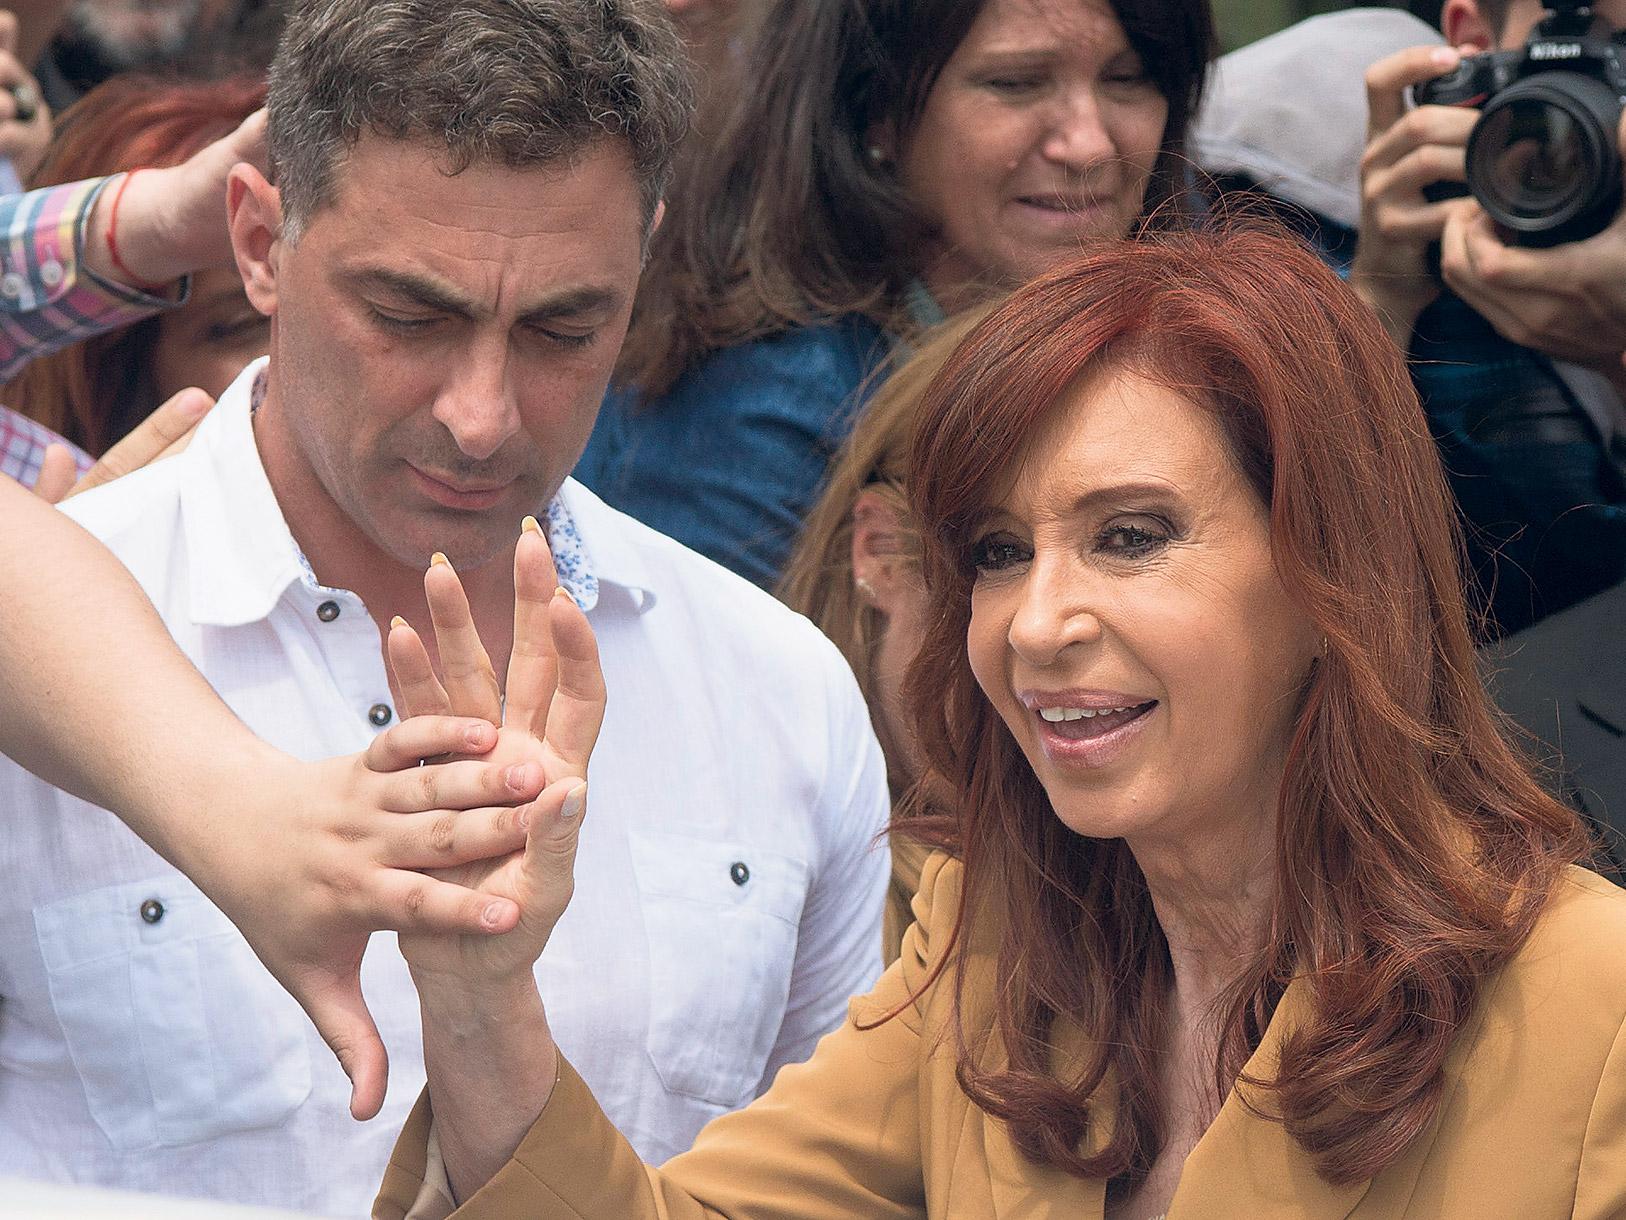 CRISTINA KIRCHNER ESCRIBIÓ UNA CARTA DIRIGIDA A MACRI LUEGO DE LA DENUNCIA PERIODÍSTICA CONTRA SU MADRE